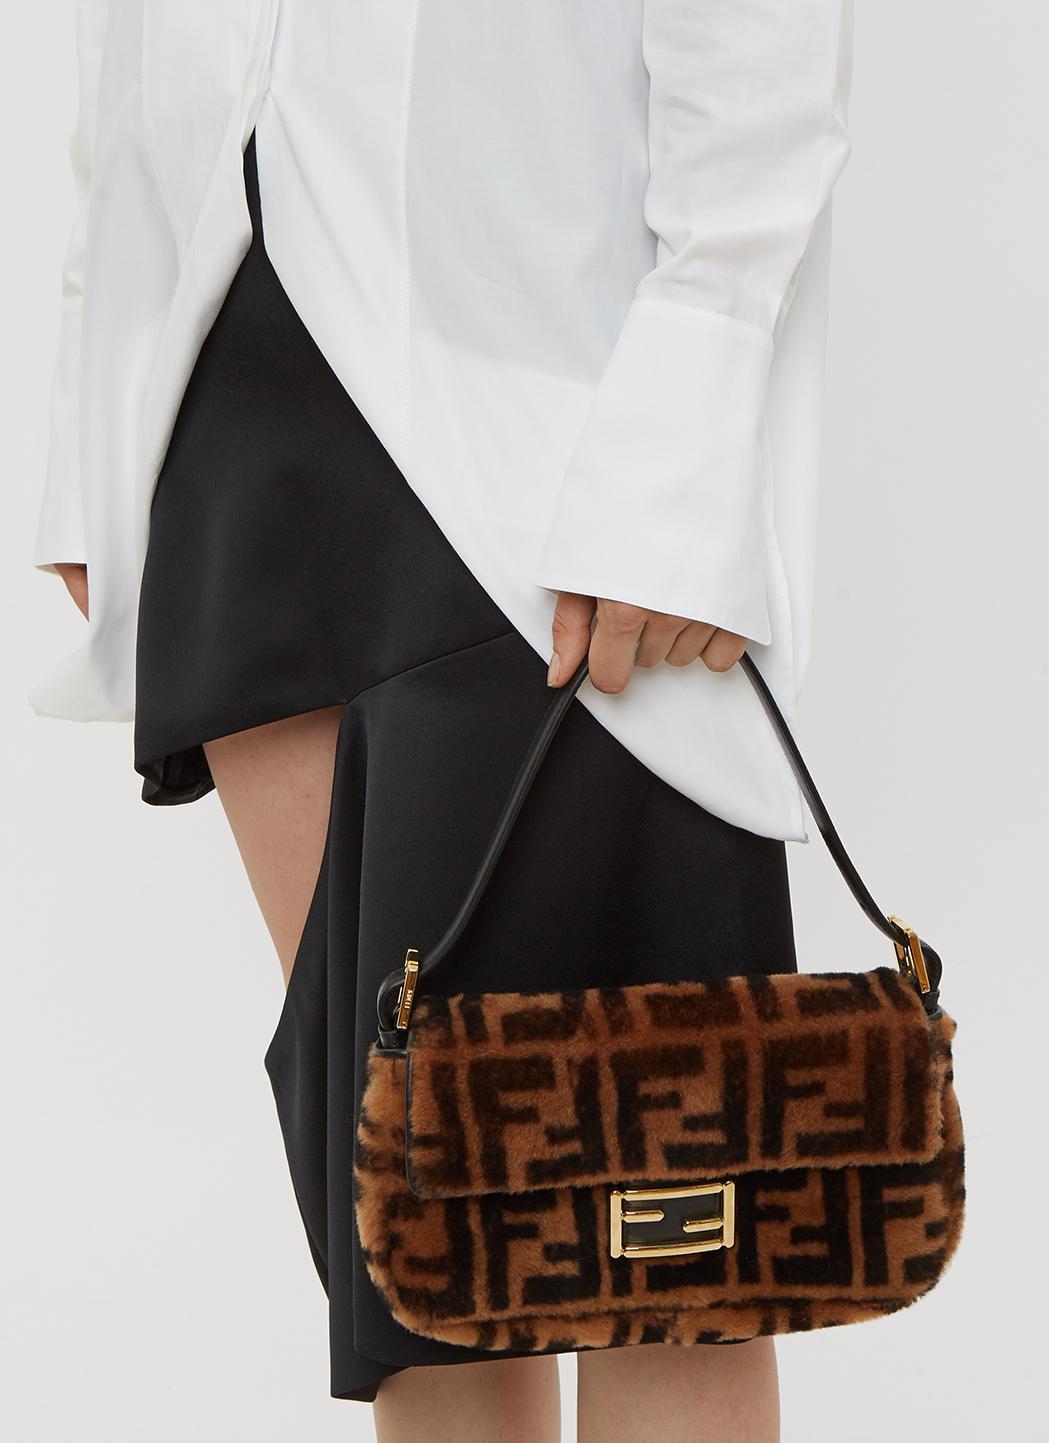 c0dcab1773 Fendi Baguette Sheepskin Bag In Brown